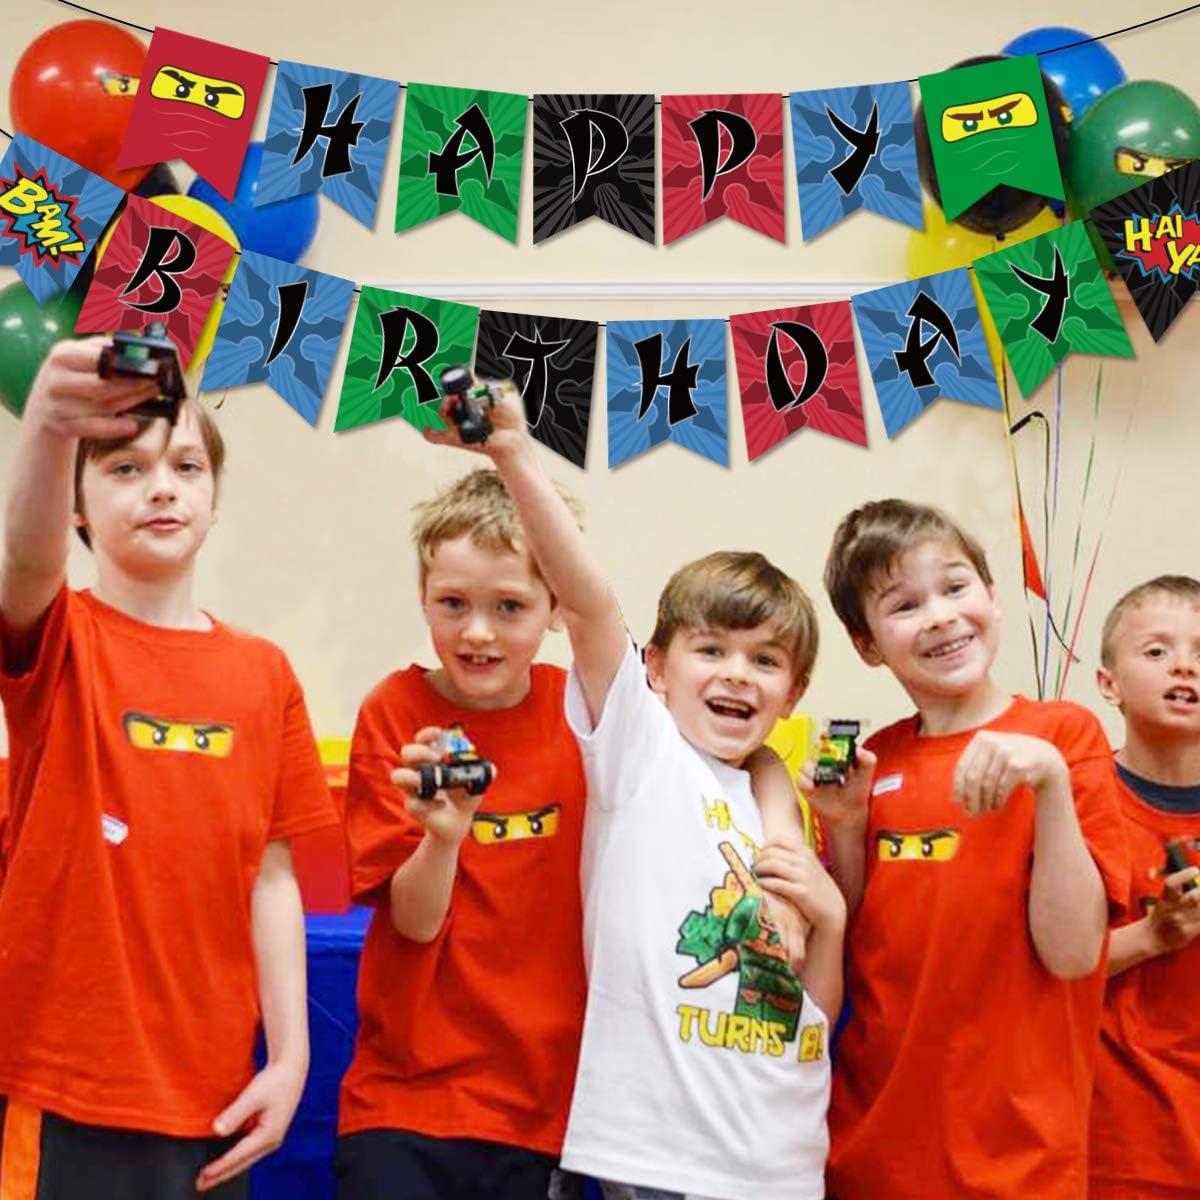 Ninja Happy Birthday Banner Birthday Party Decorations Ninja Party Supplies for Boys Ninja Warrior Party Supplies